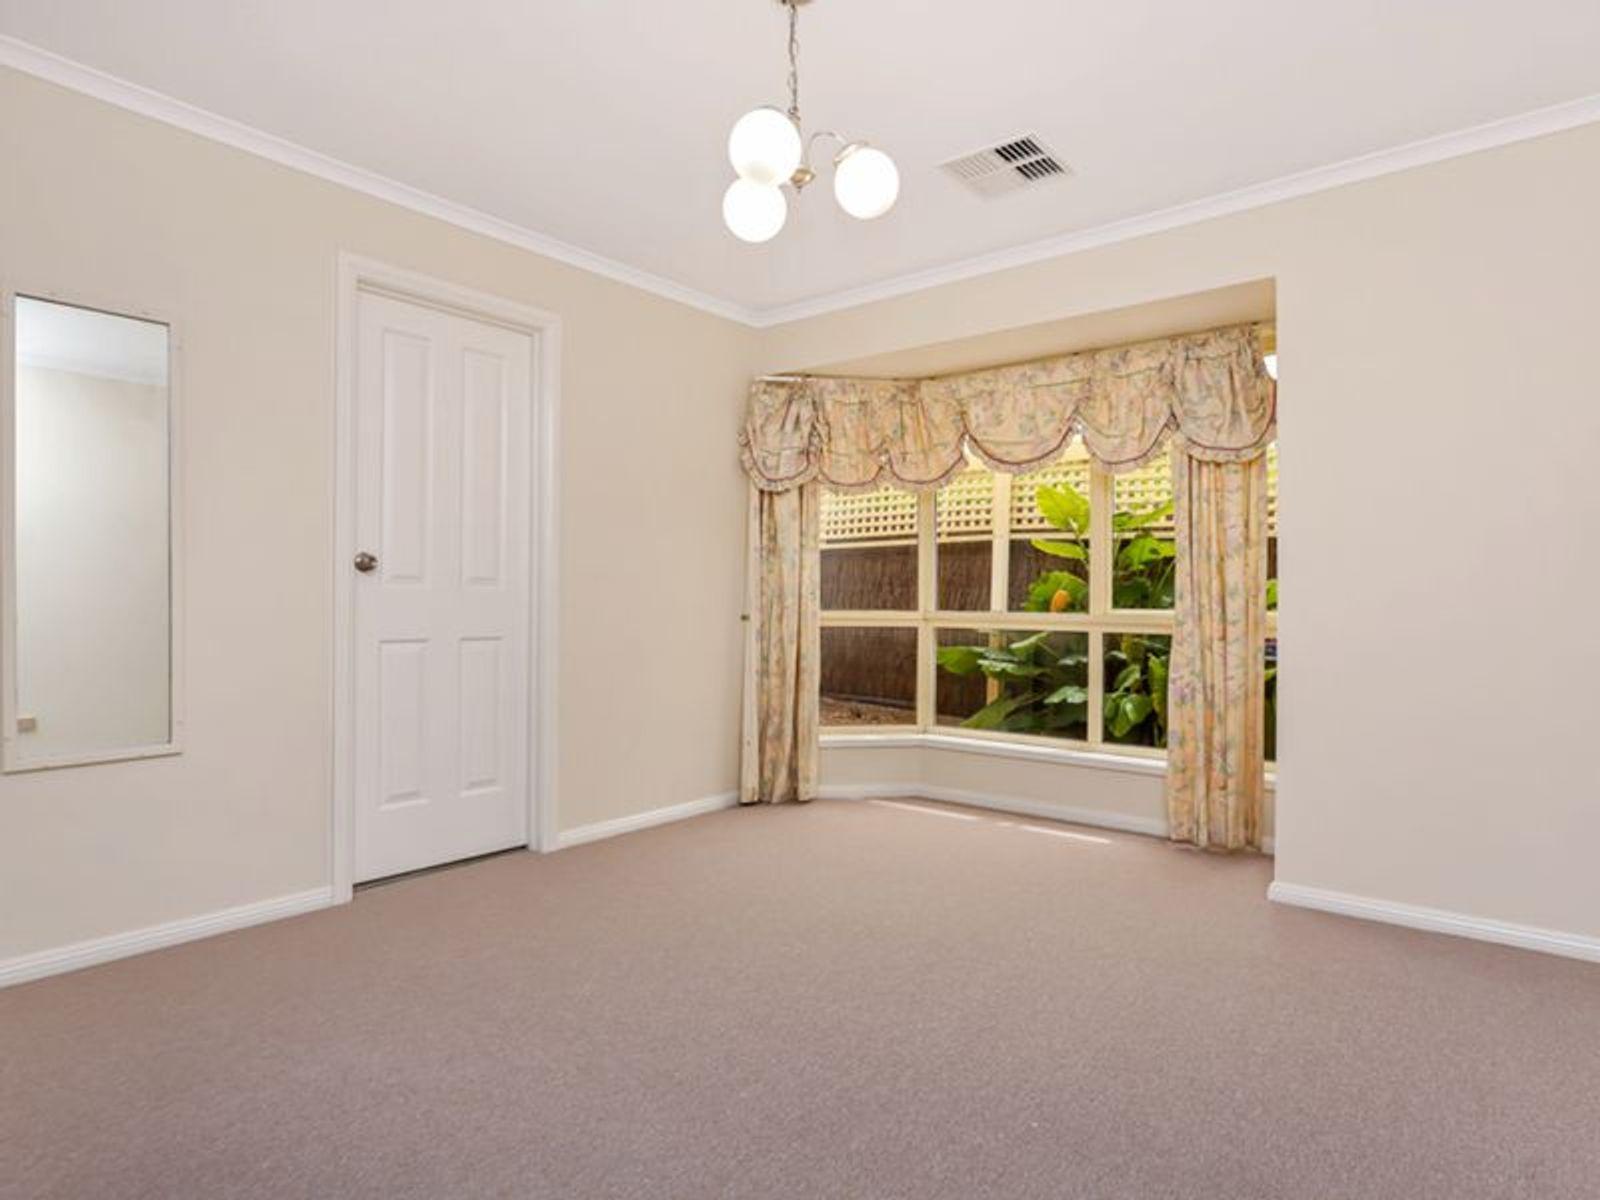 36 Crestview Place, Wynn Vale, SA 5127